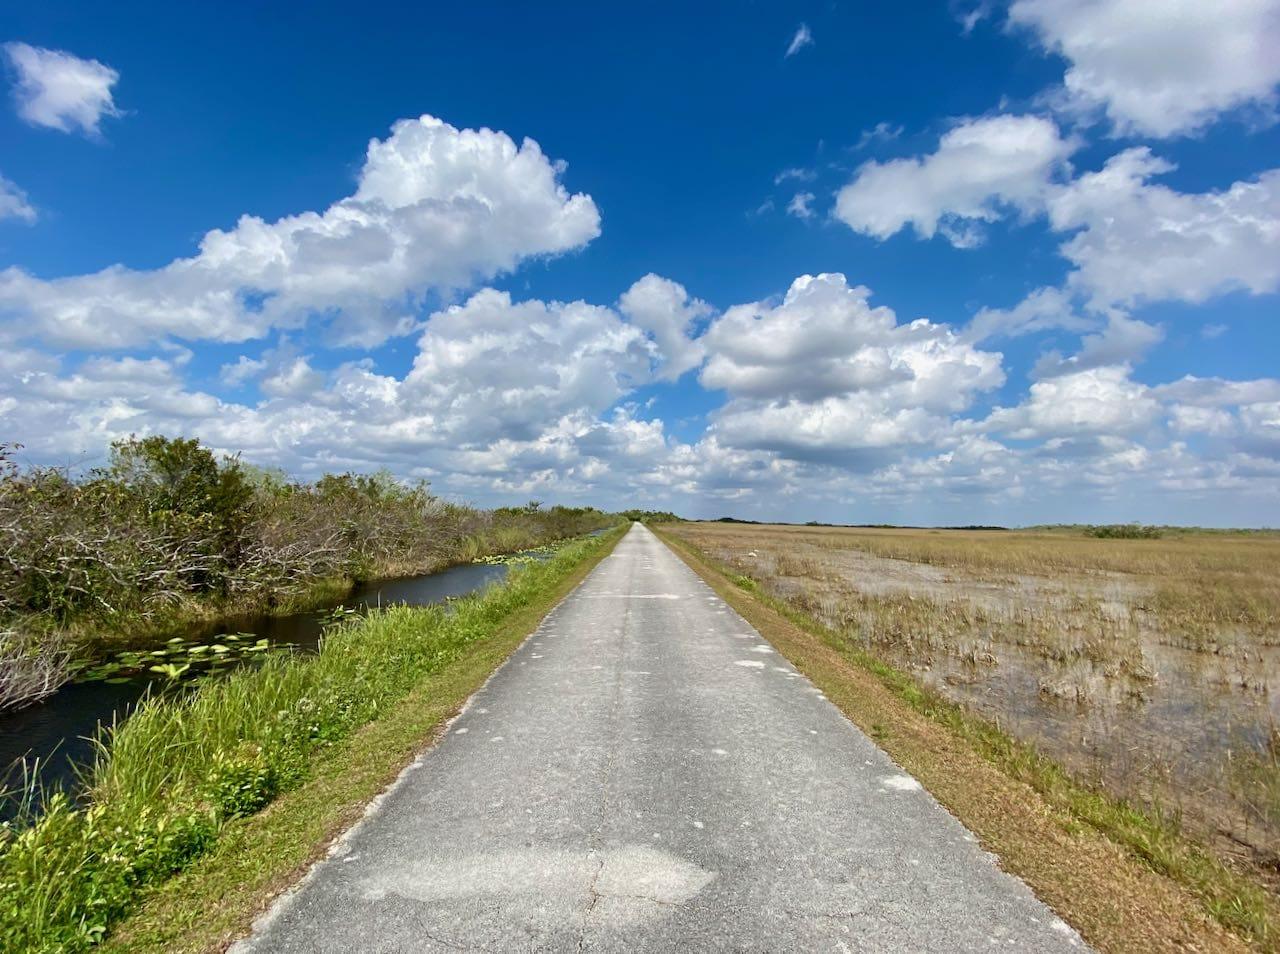 Shark Valley Everglades National Park 17 steder å stoppe langs Tamiami Trail/ U.S Highway 41